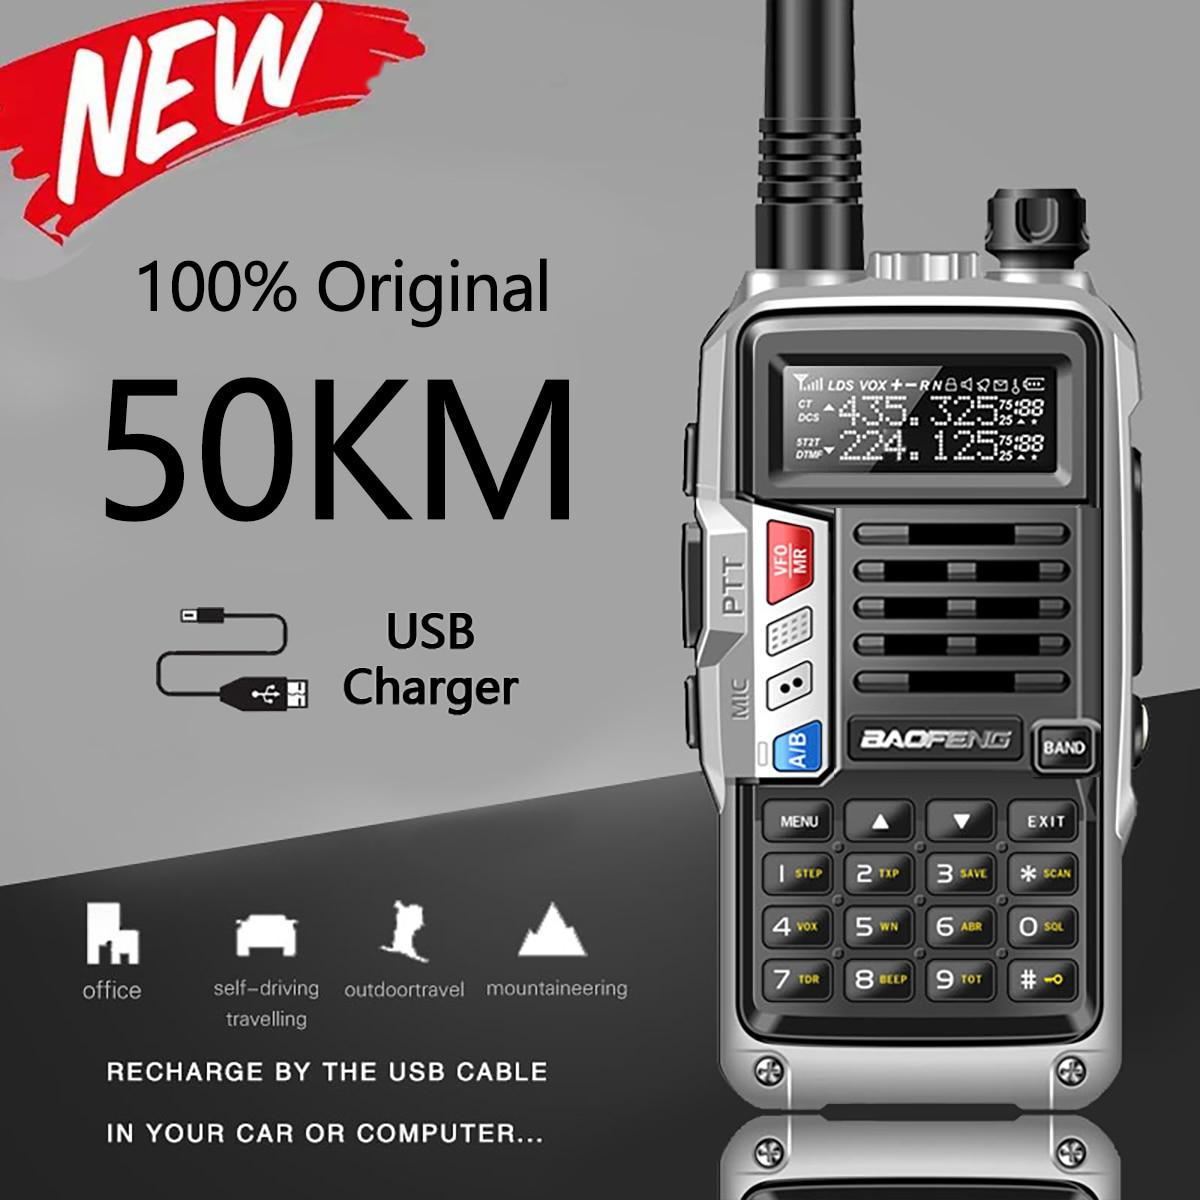 Baofeng New Professional Walkie Talkie UV-S9 PLUS 50km 128 Channels VHF UHF Dual Band Two Way CB Ham Radio Upgrade For UV-5R